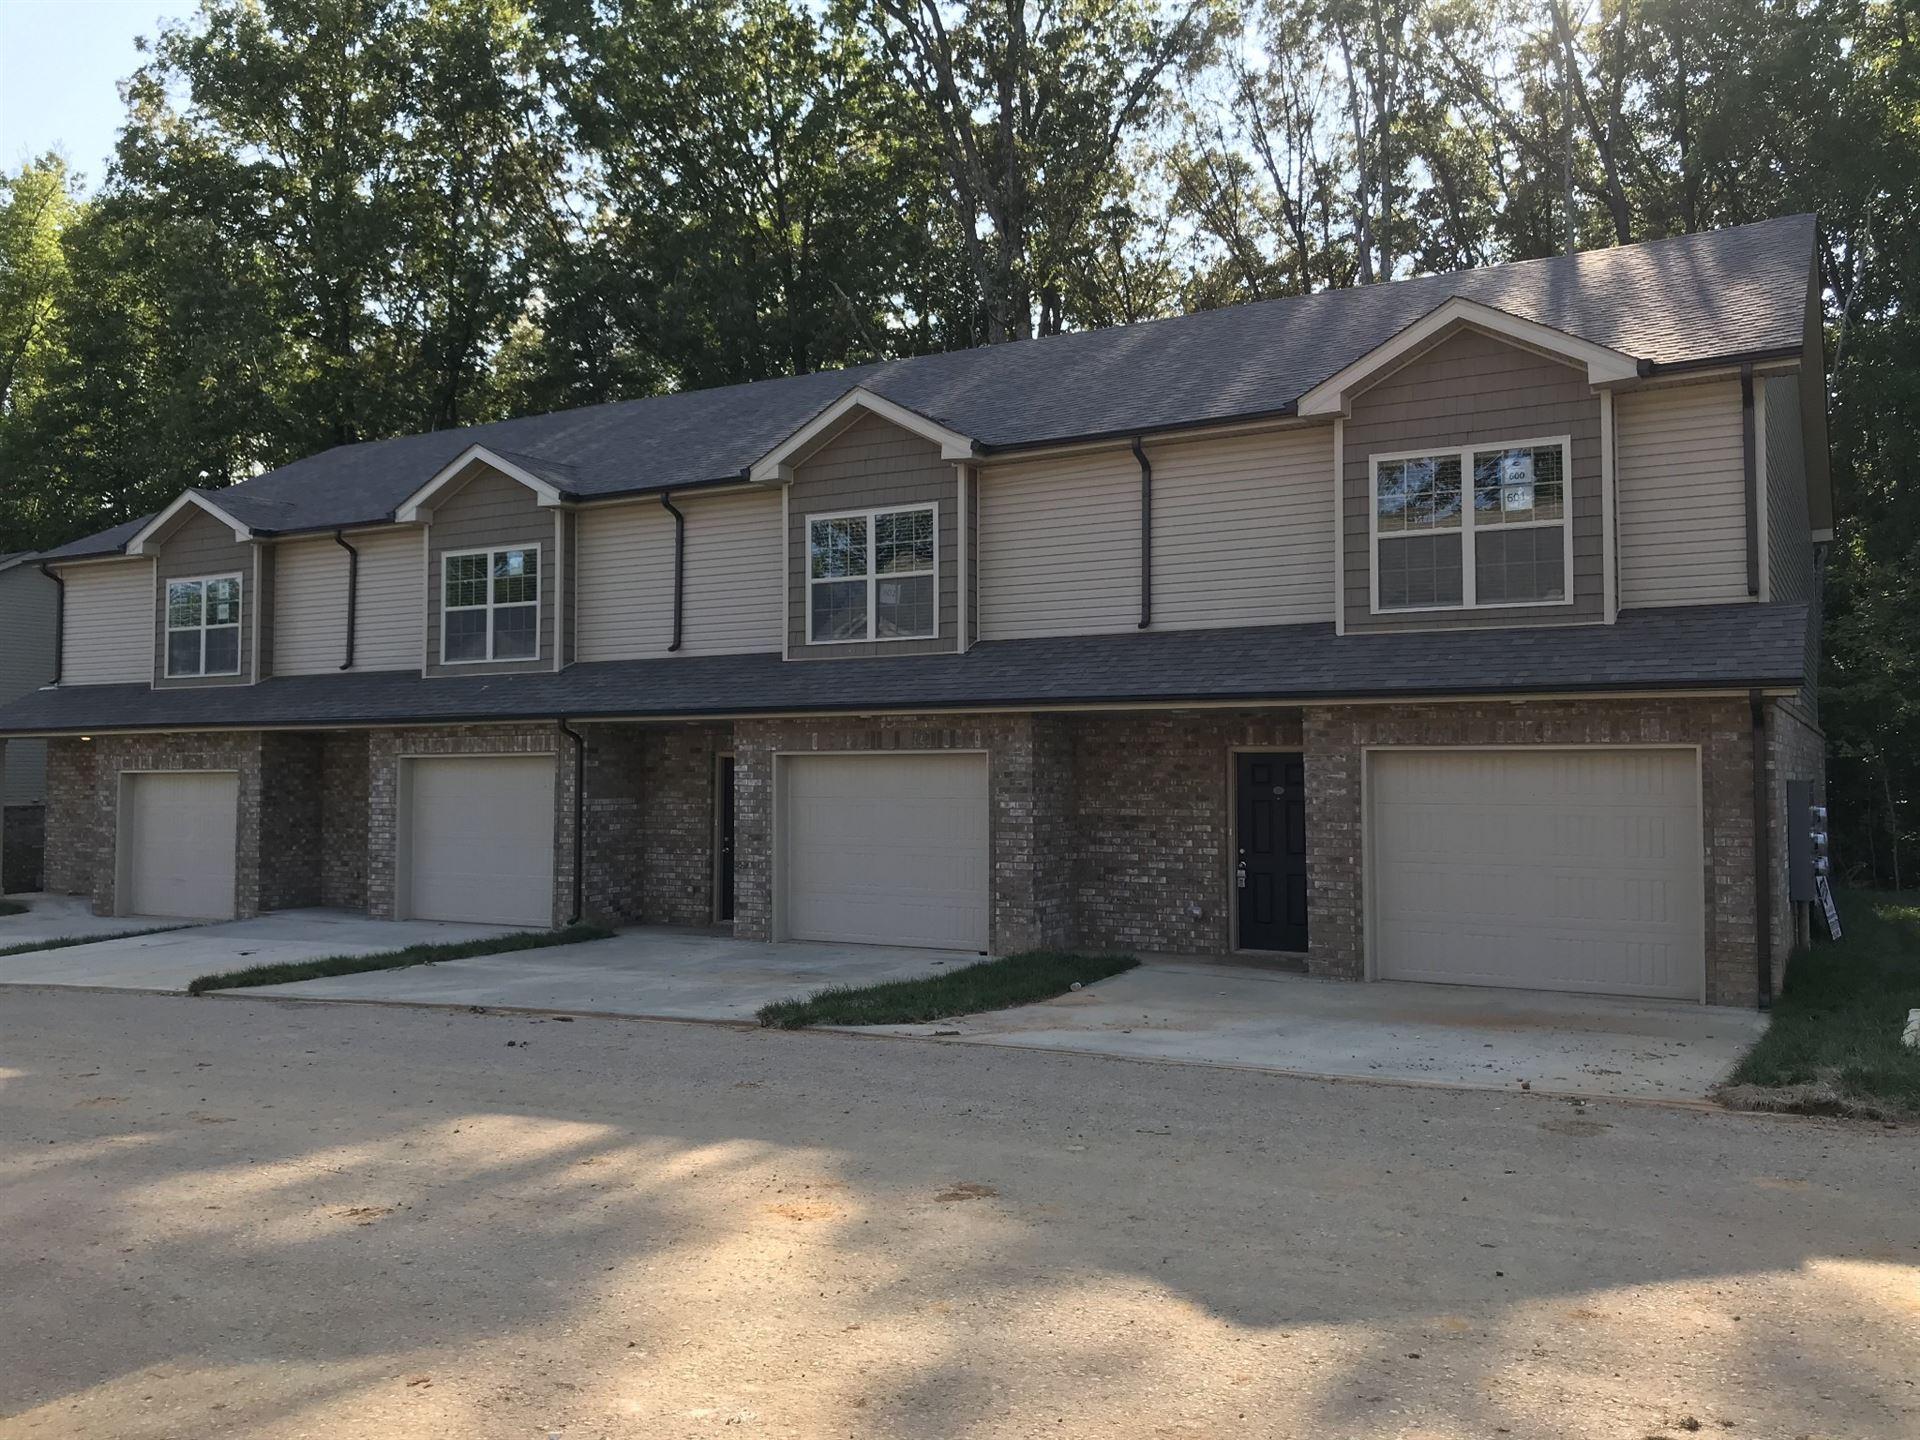 135 Country Lane Unit 604, Clarksville, TN 37043 - MLS#: 2178386